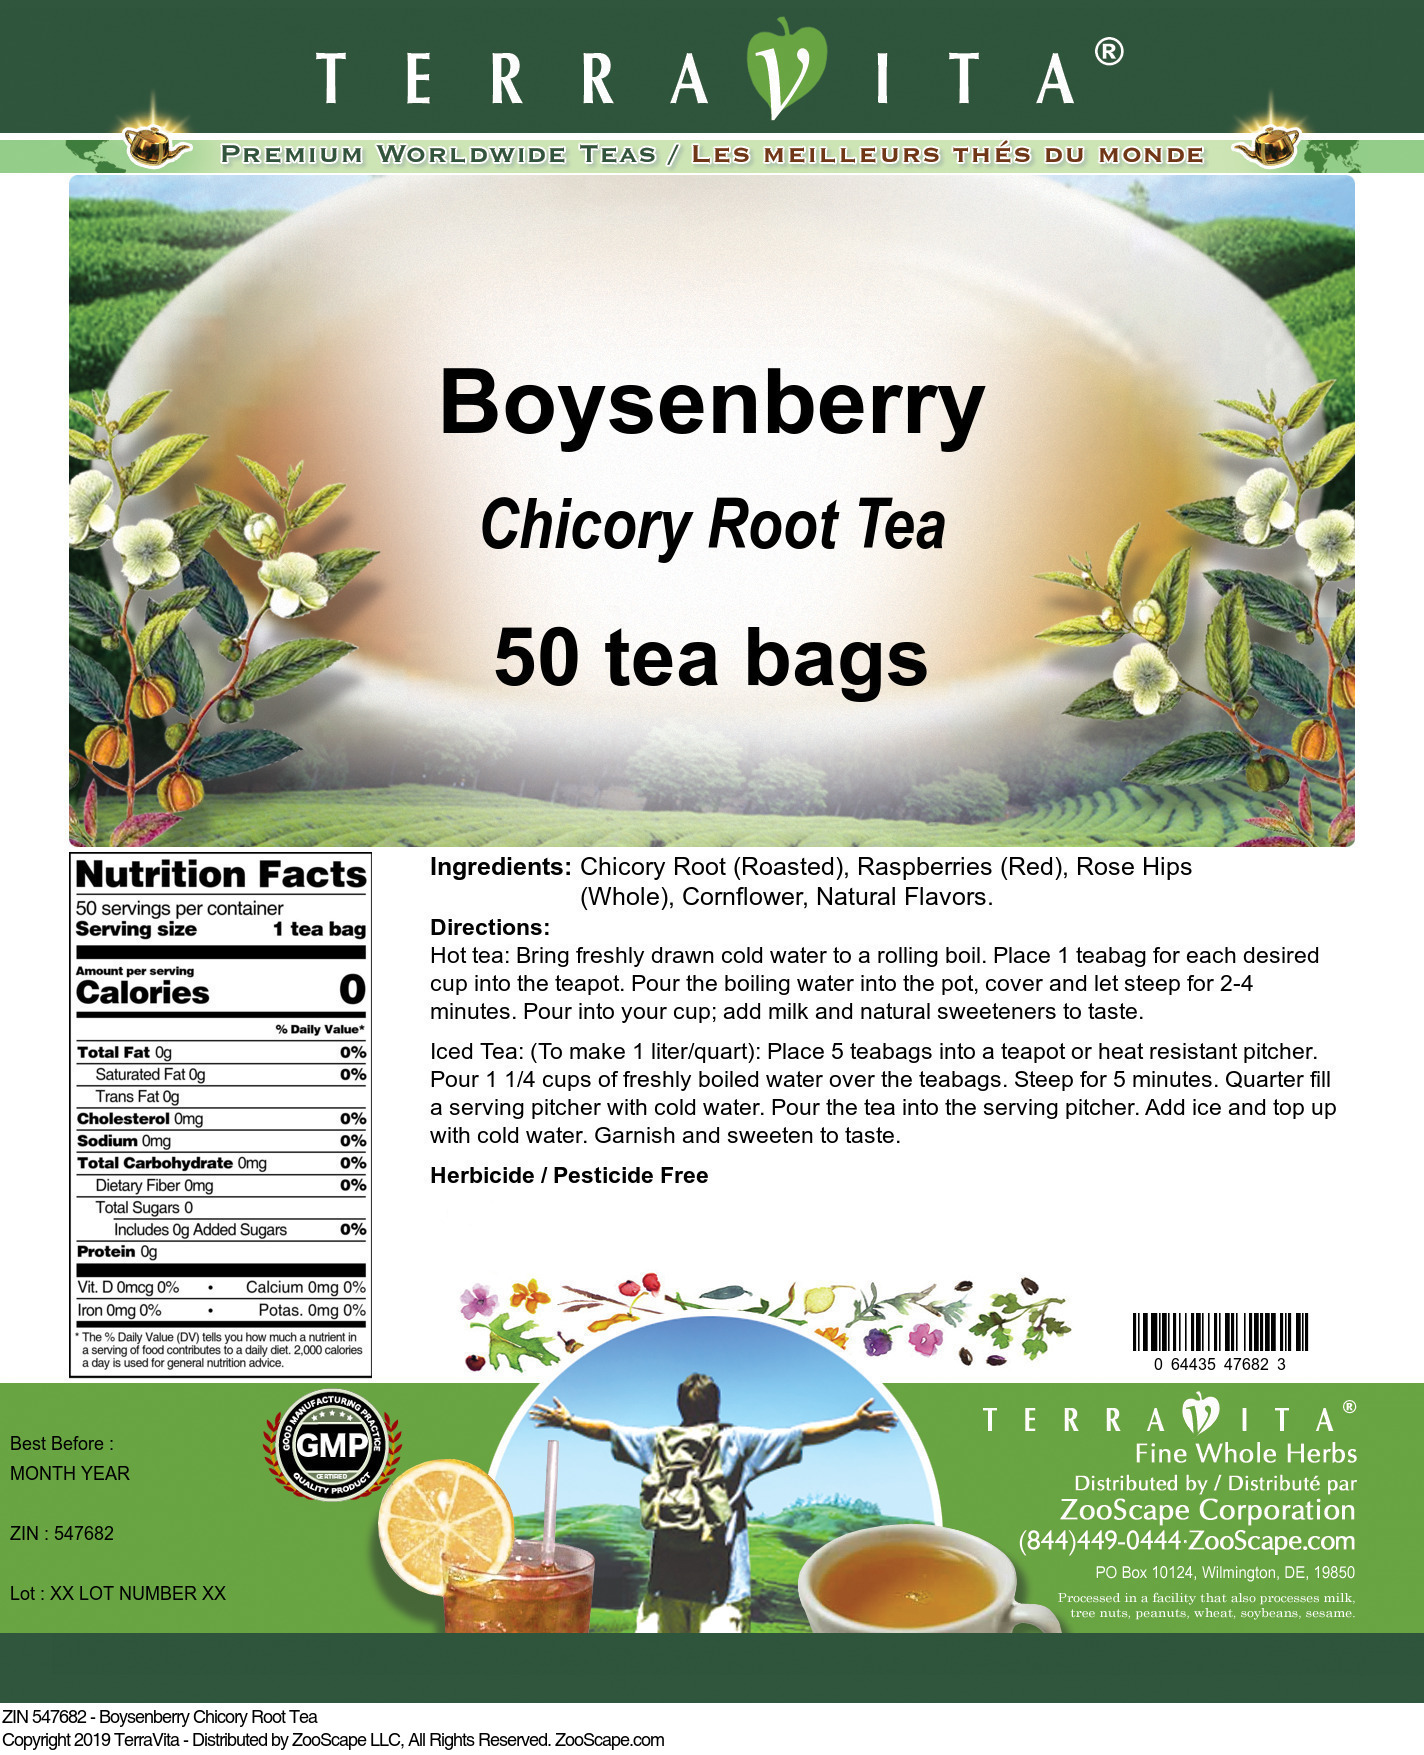 Boysenberry Chicory Root Tea